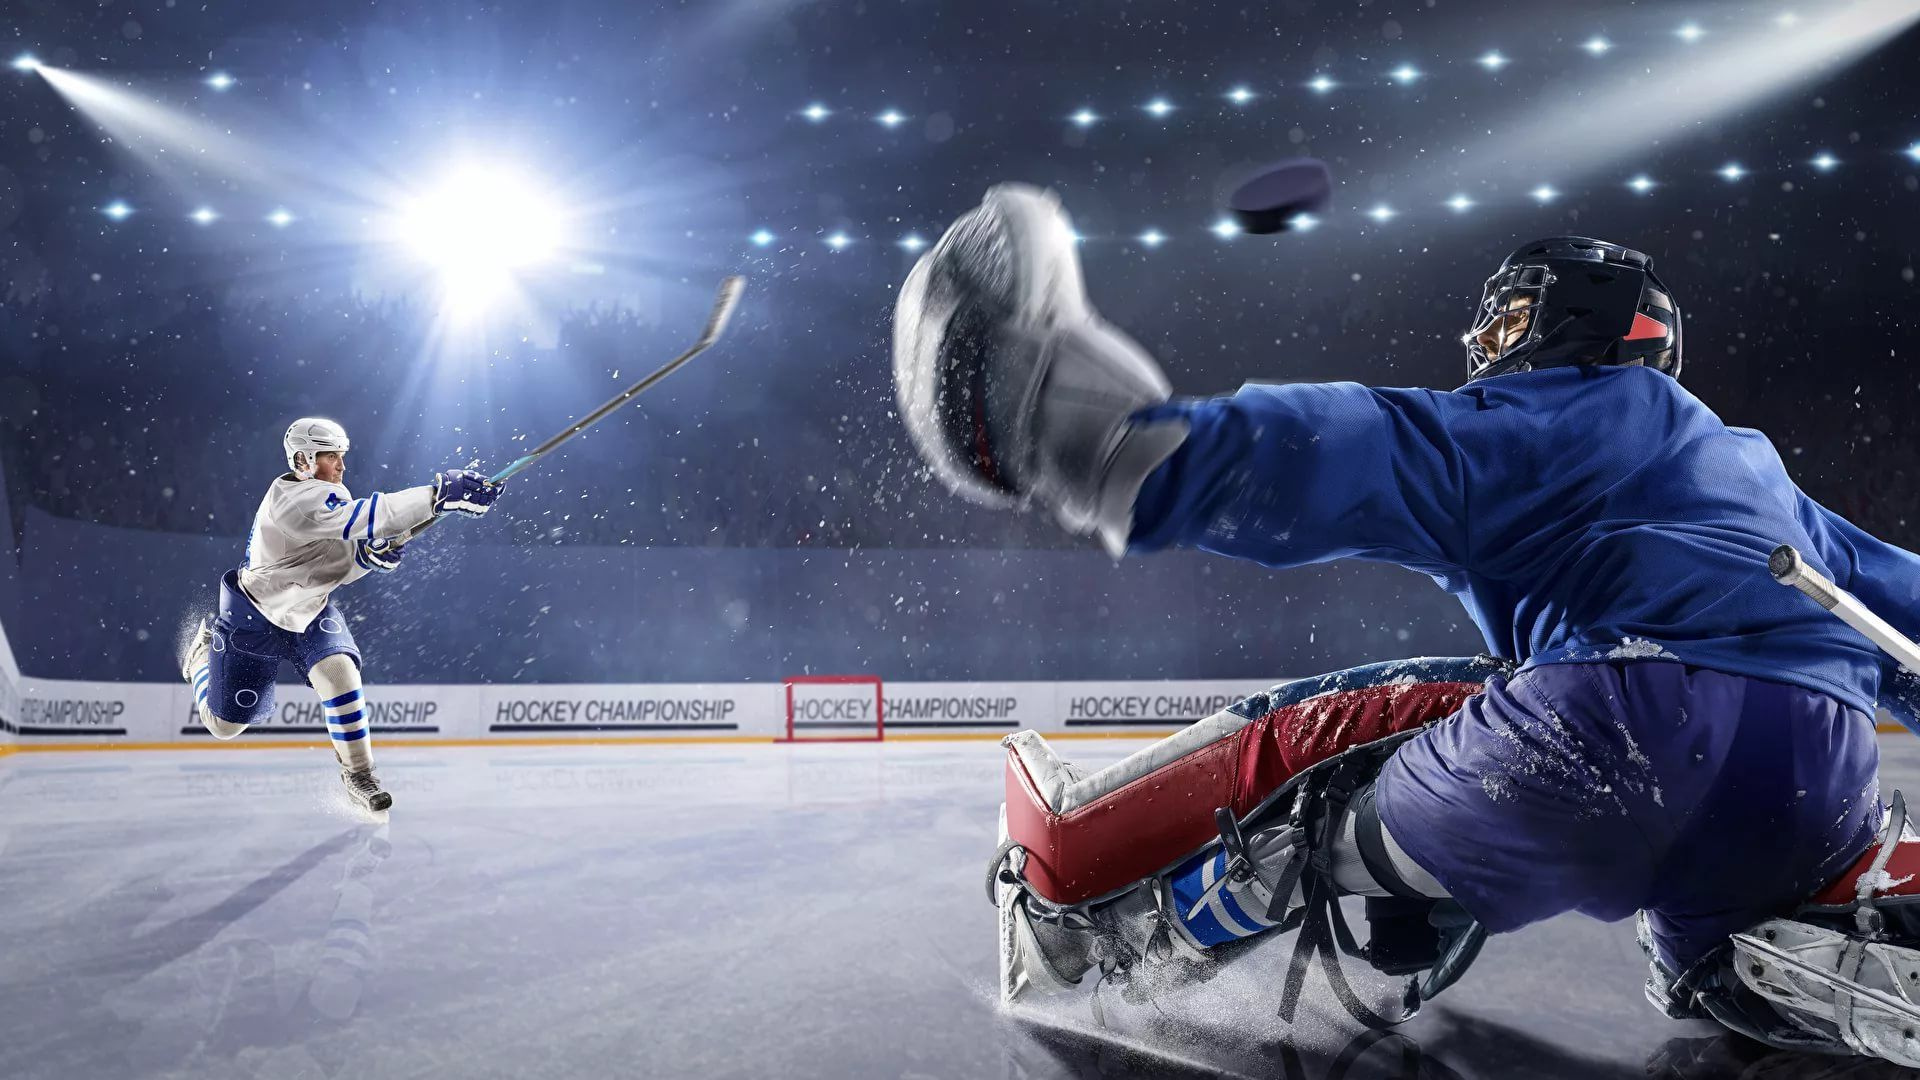 Ice Hockey HD Wallpaper